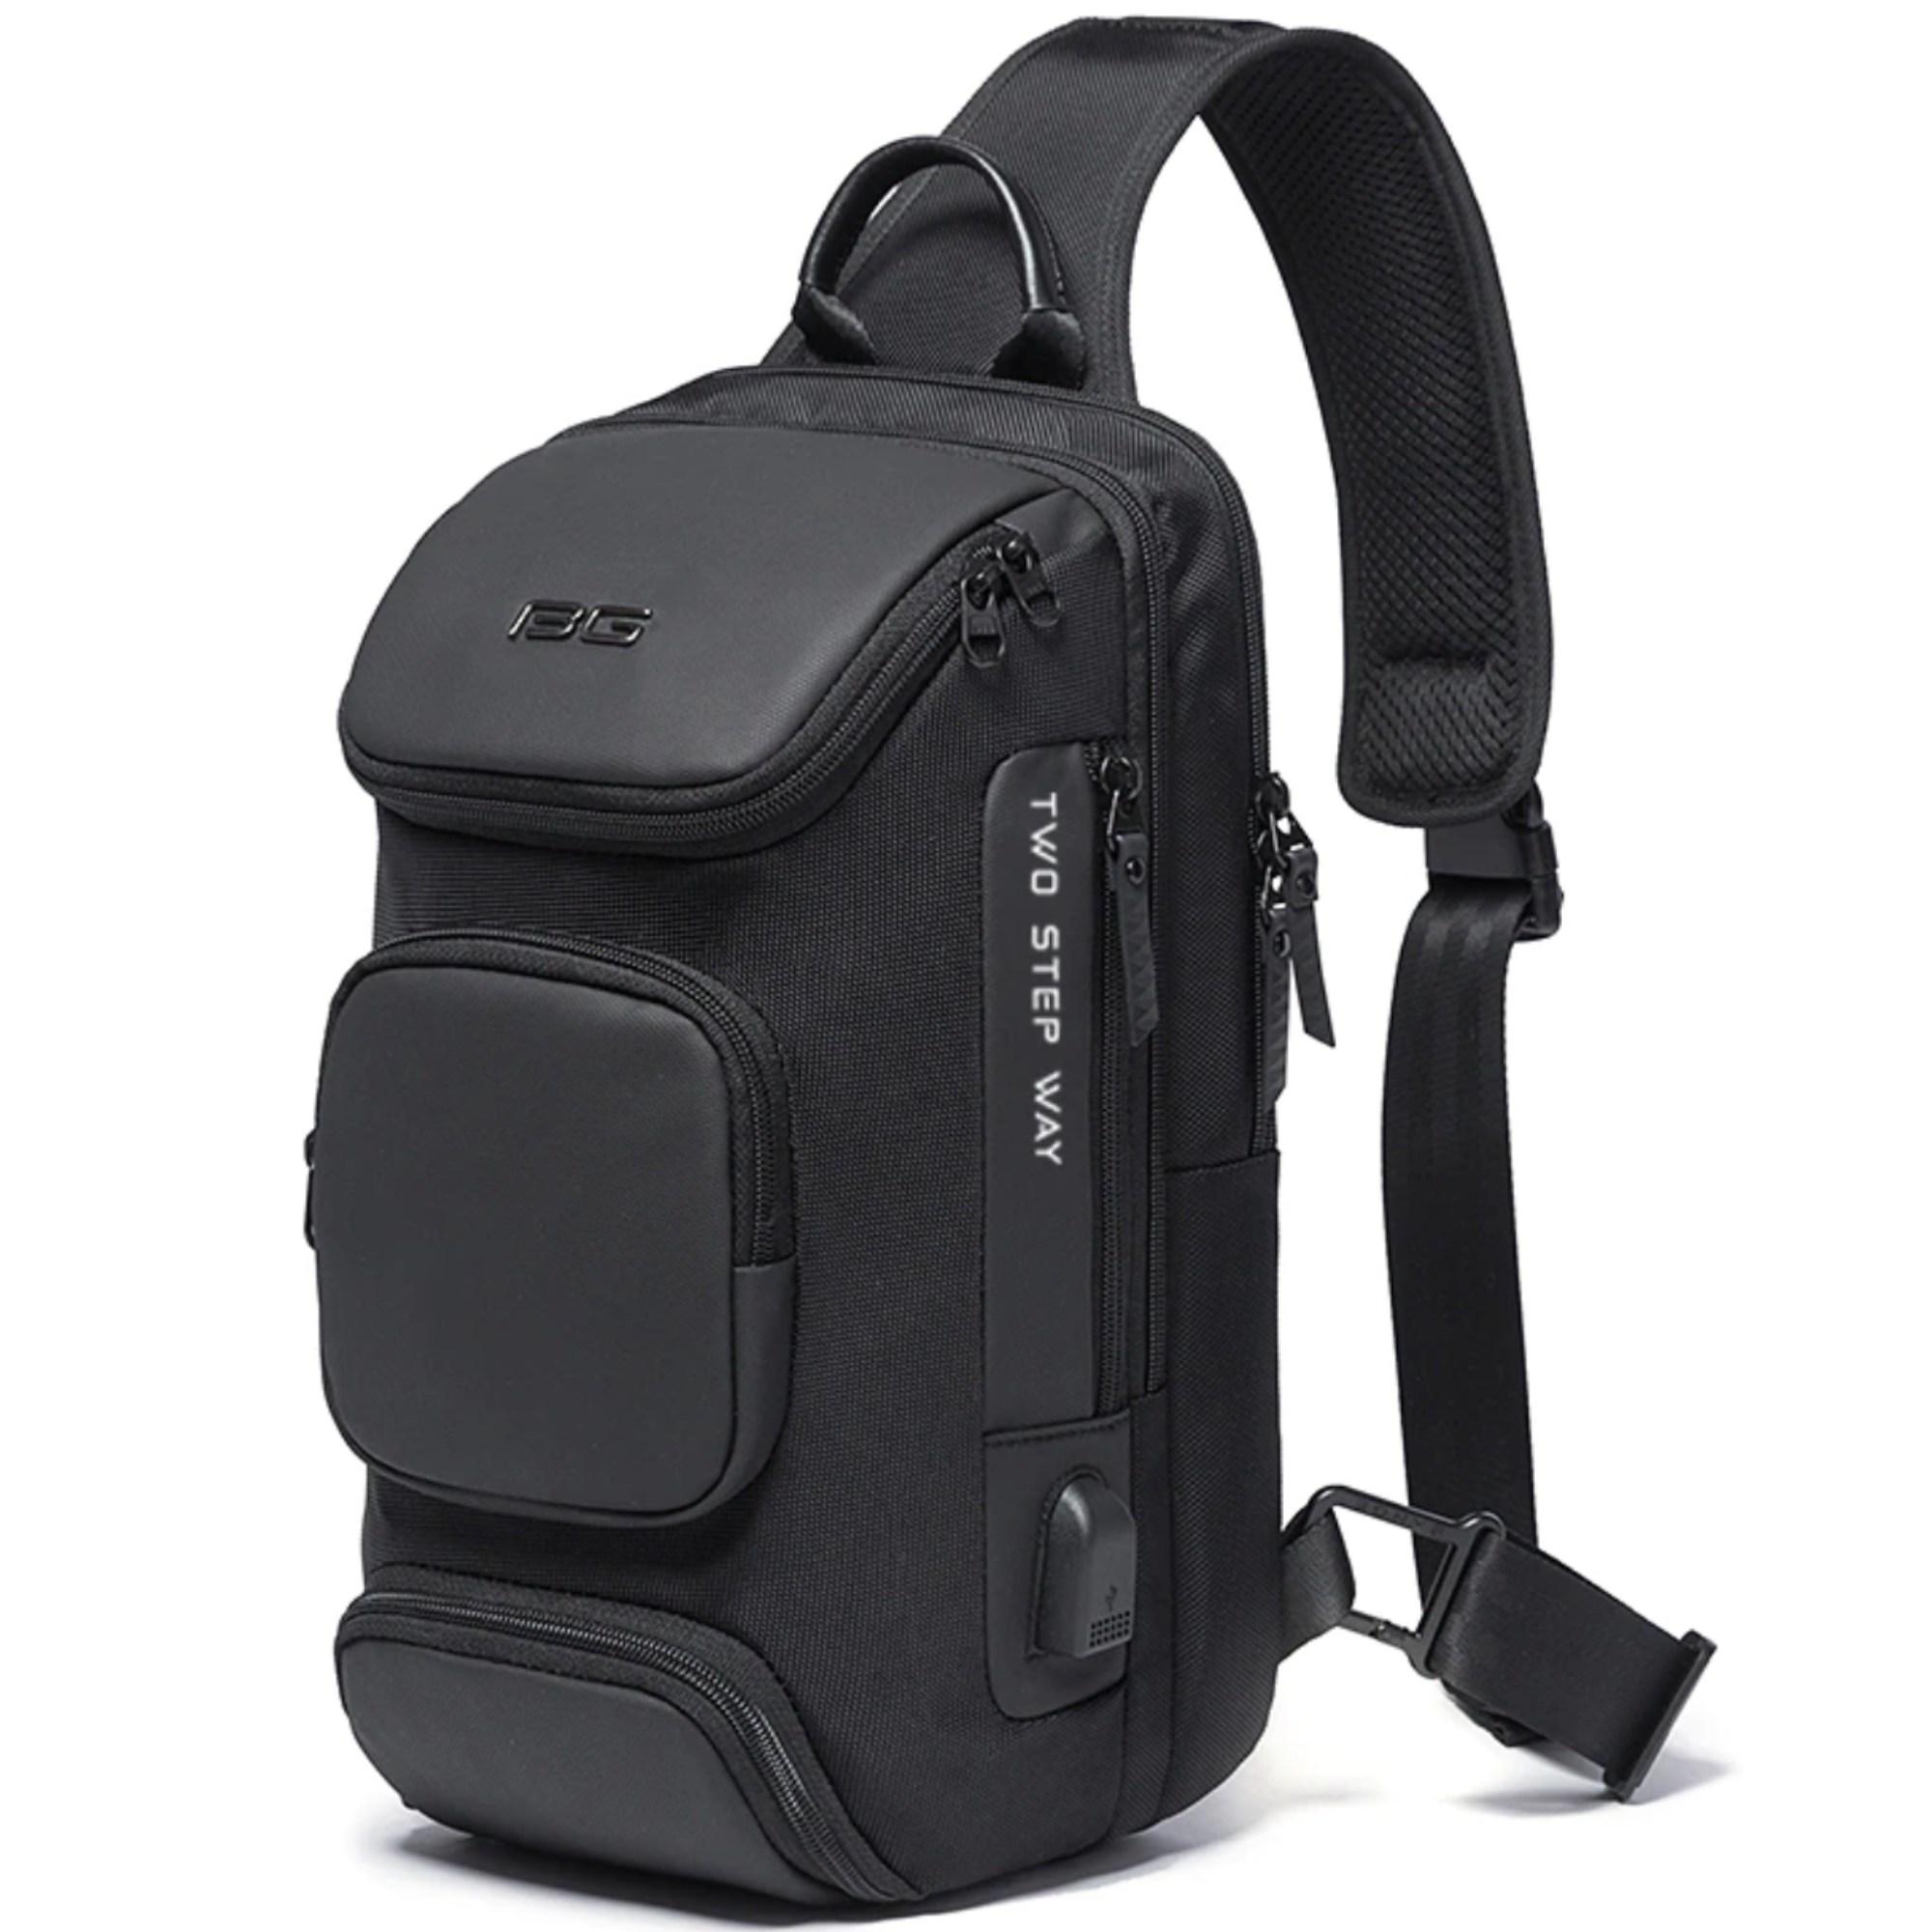 Bolsa Mochila Mini Transversal USB BG Keep Walking